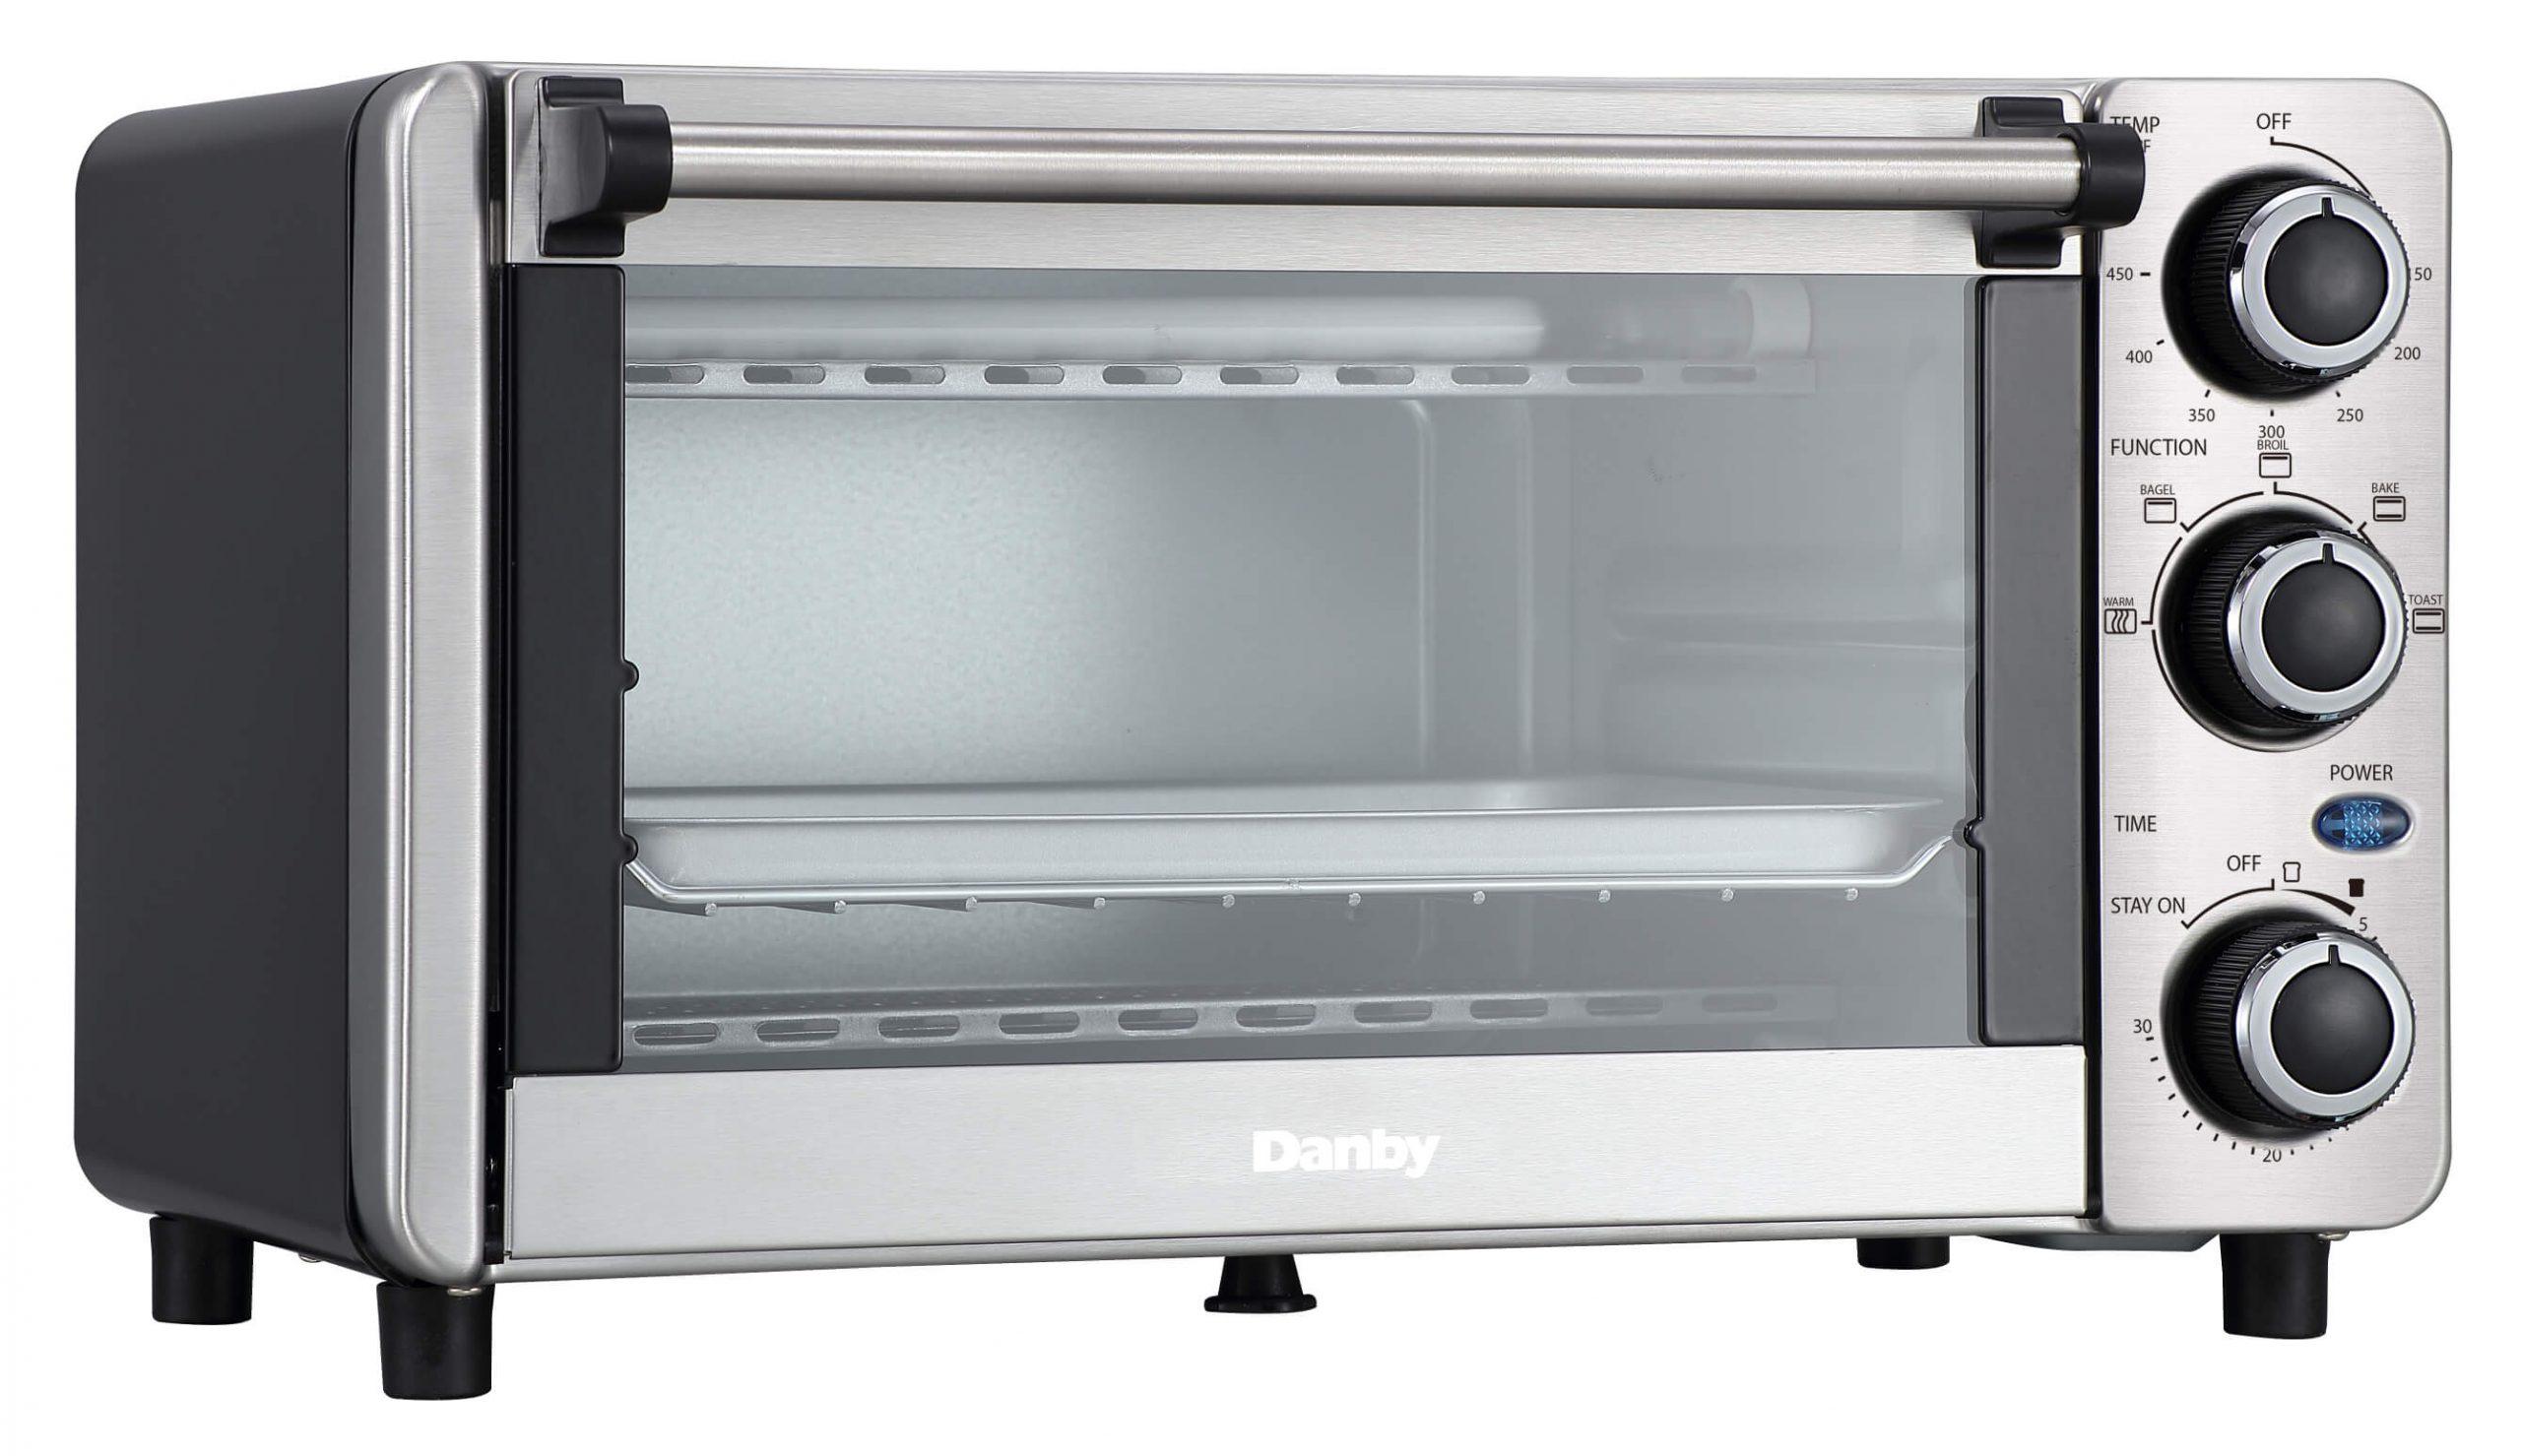 Danby 0.4 cu ft/12L 4 Slice Countertop Toaster Oven